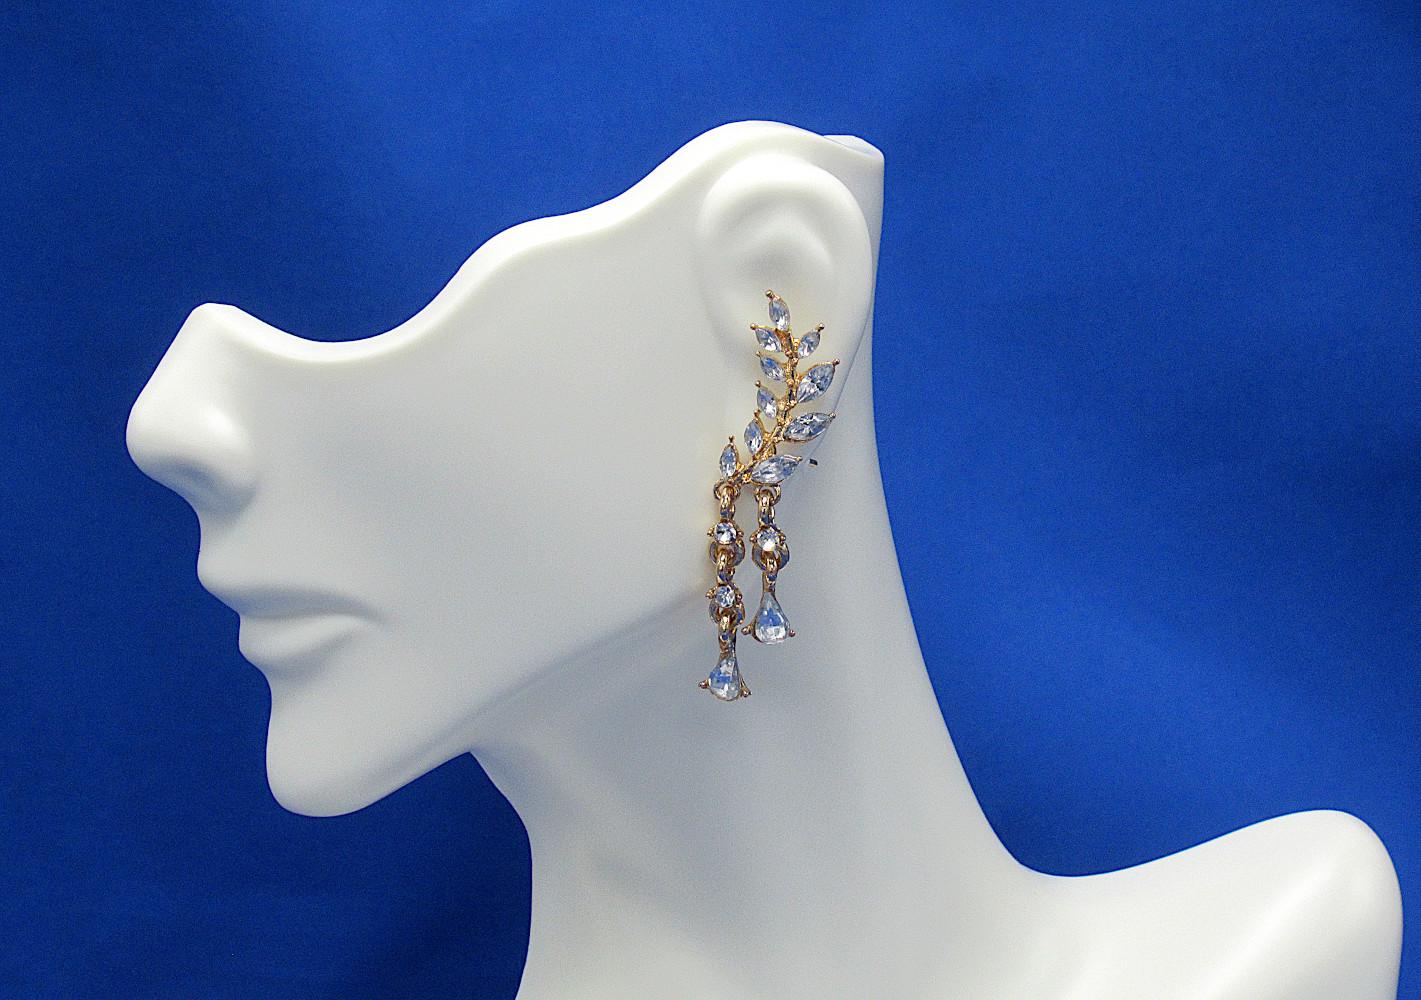 PA-109_Angel-Wings-Crystal-Pierced-Stud-Earrings_gold_blue-bkgrnd2.jpg